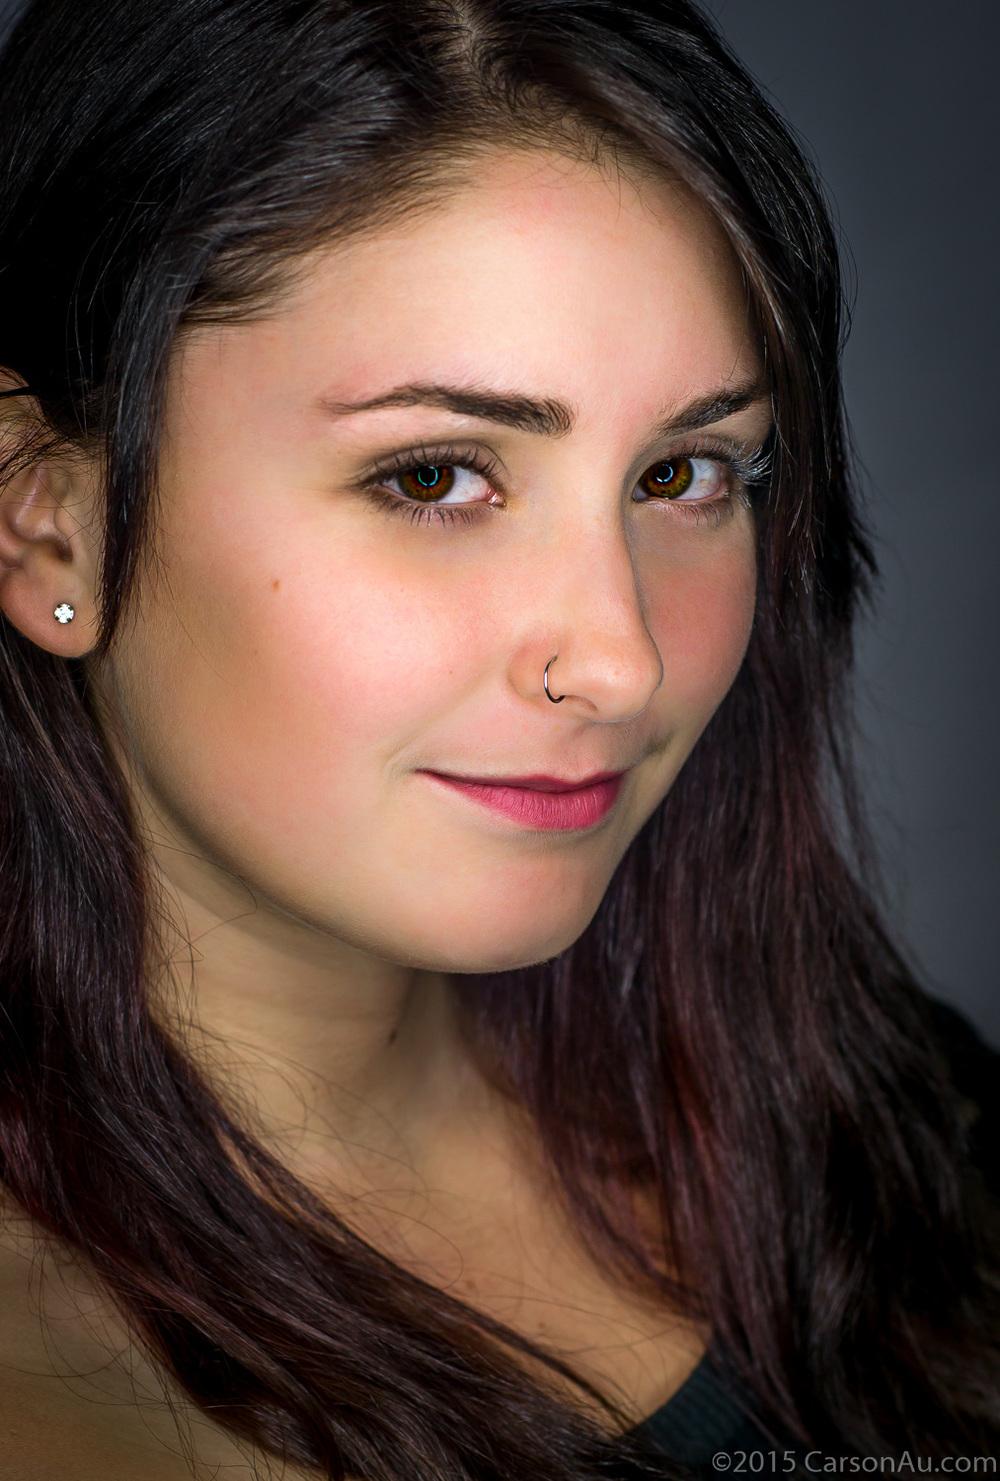 Sophia, Actor